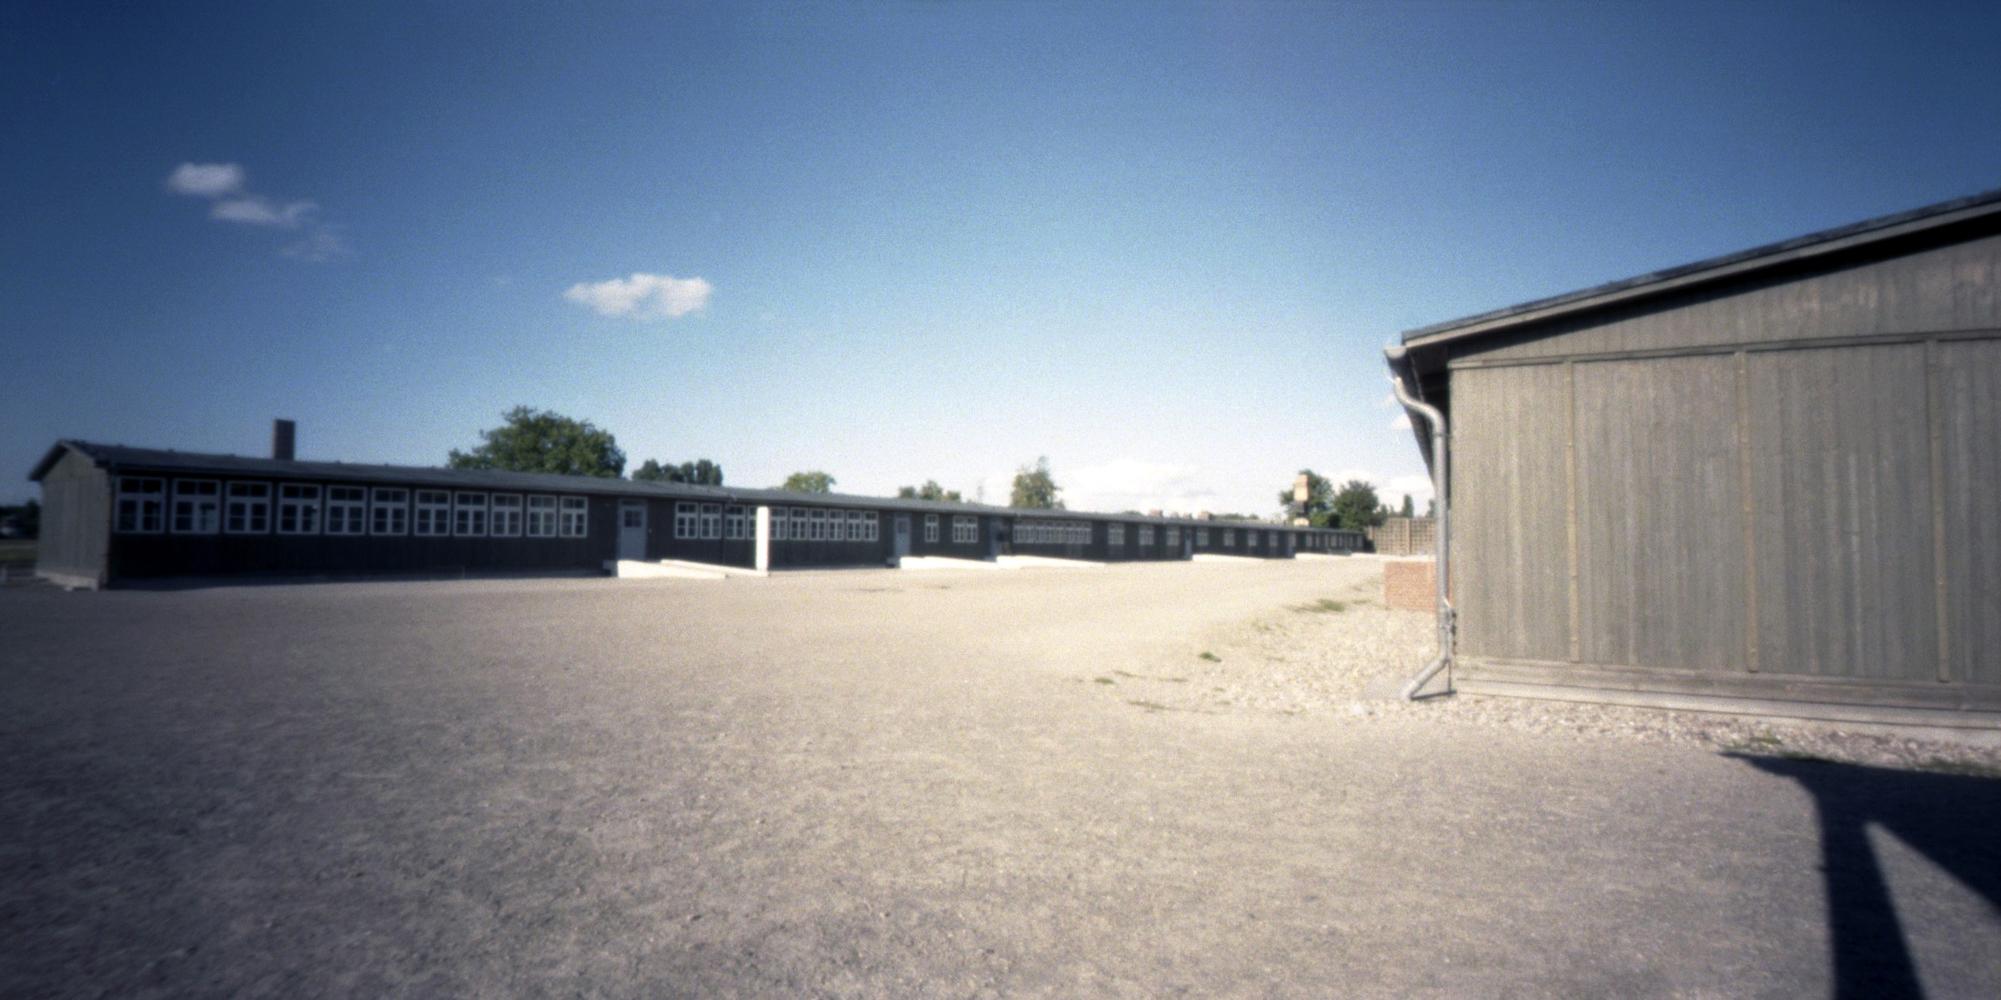 Sachsenhausen barracks, Oranienburg, Germany.